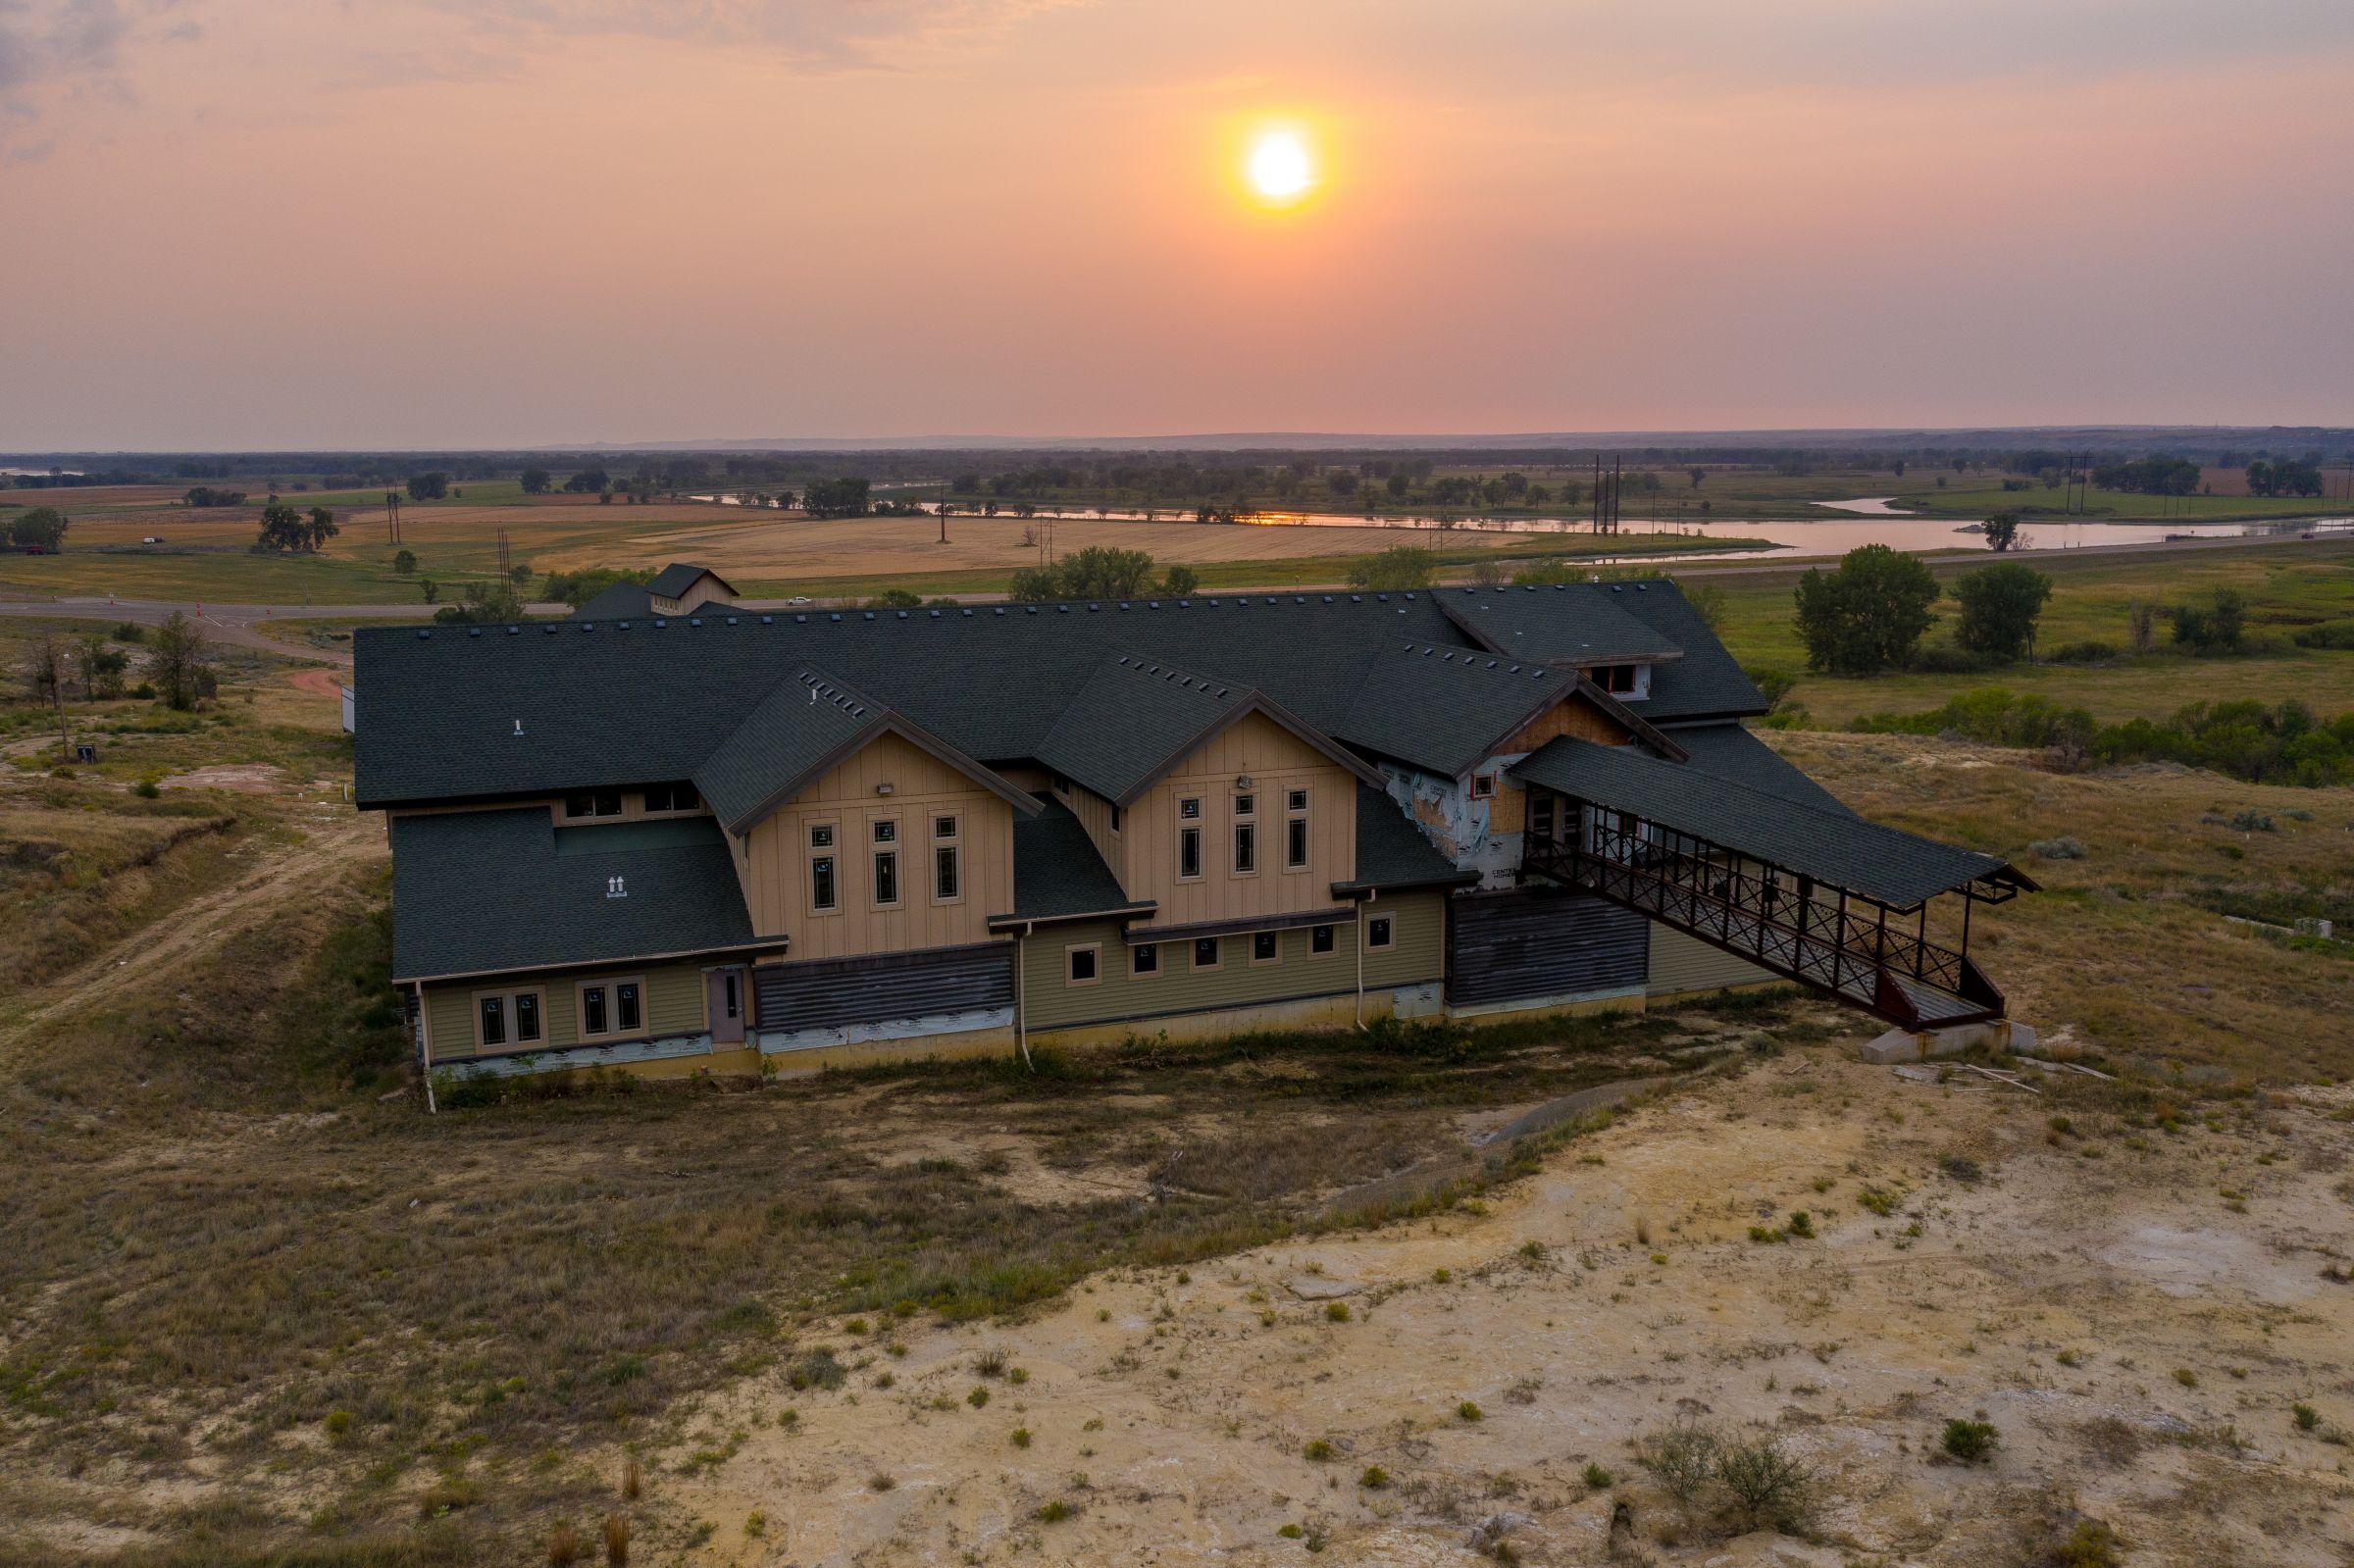 auctions-land-mckenzie-county-north-dakota-270-acres-listing-number-15735-3-2021-09-09-211736.jpeg